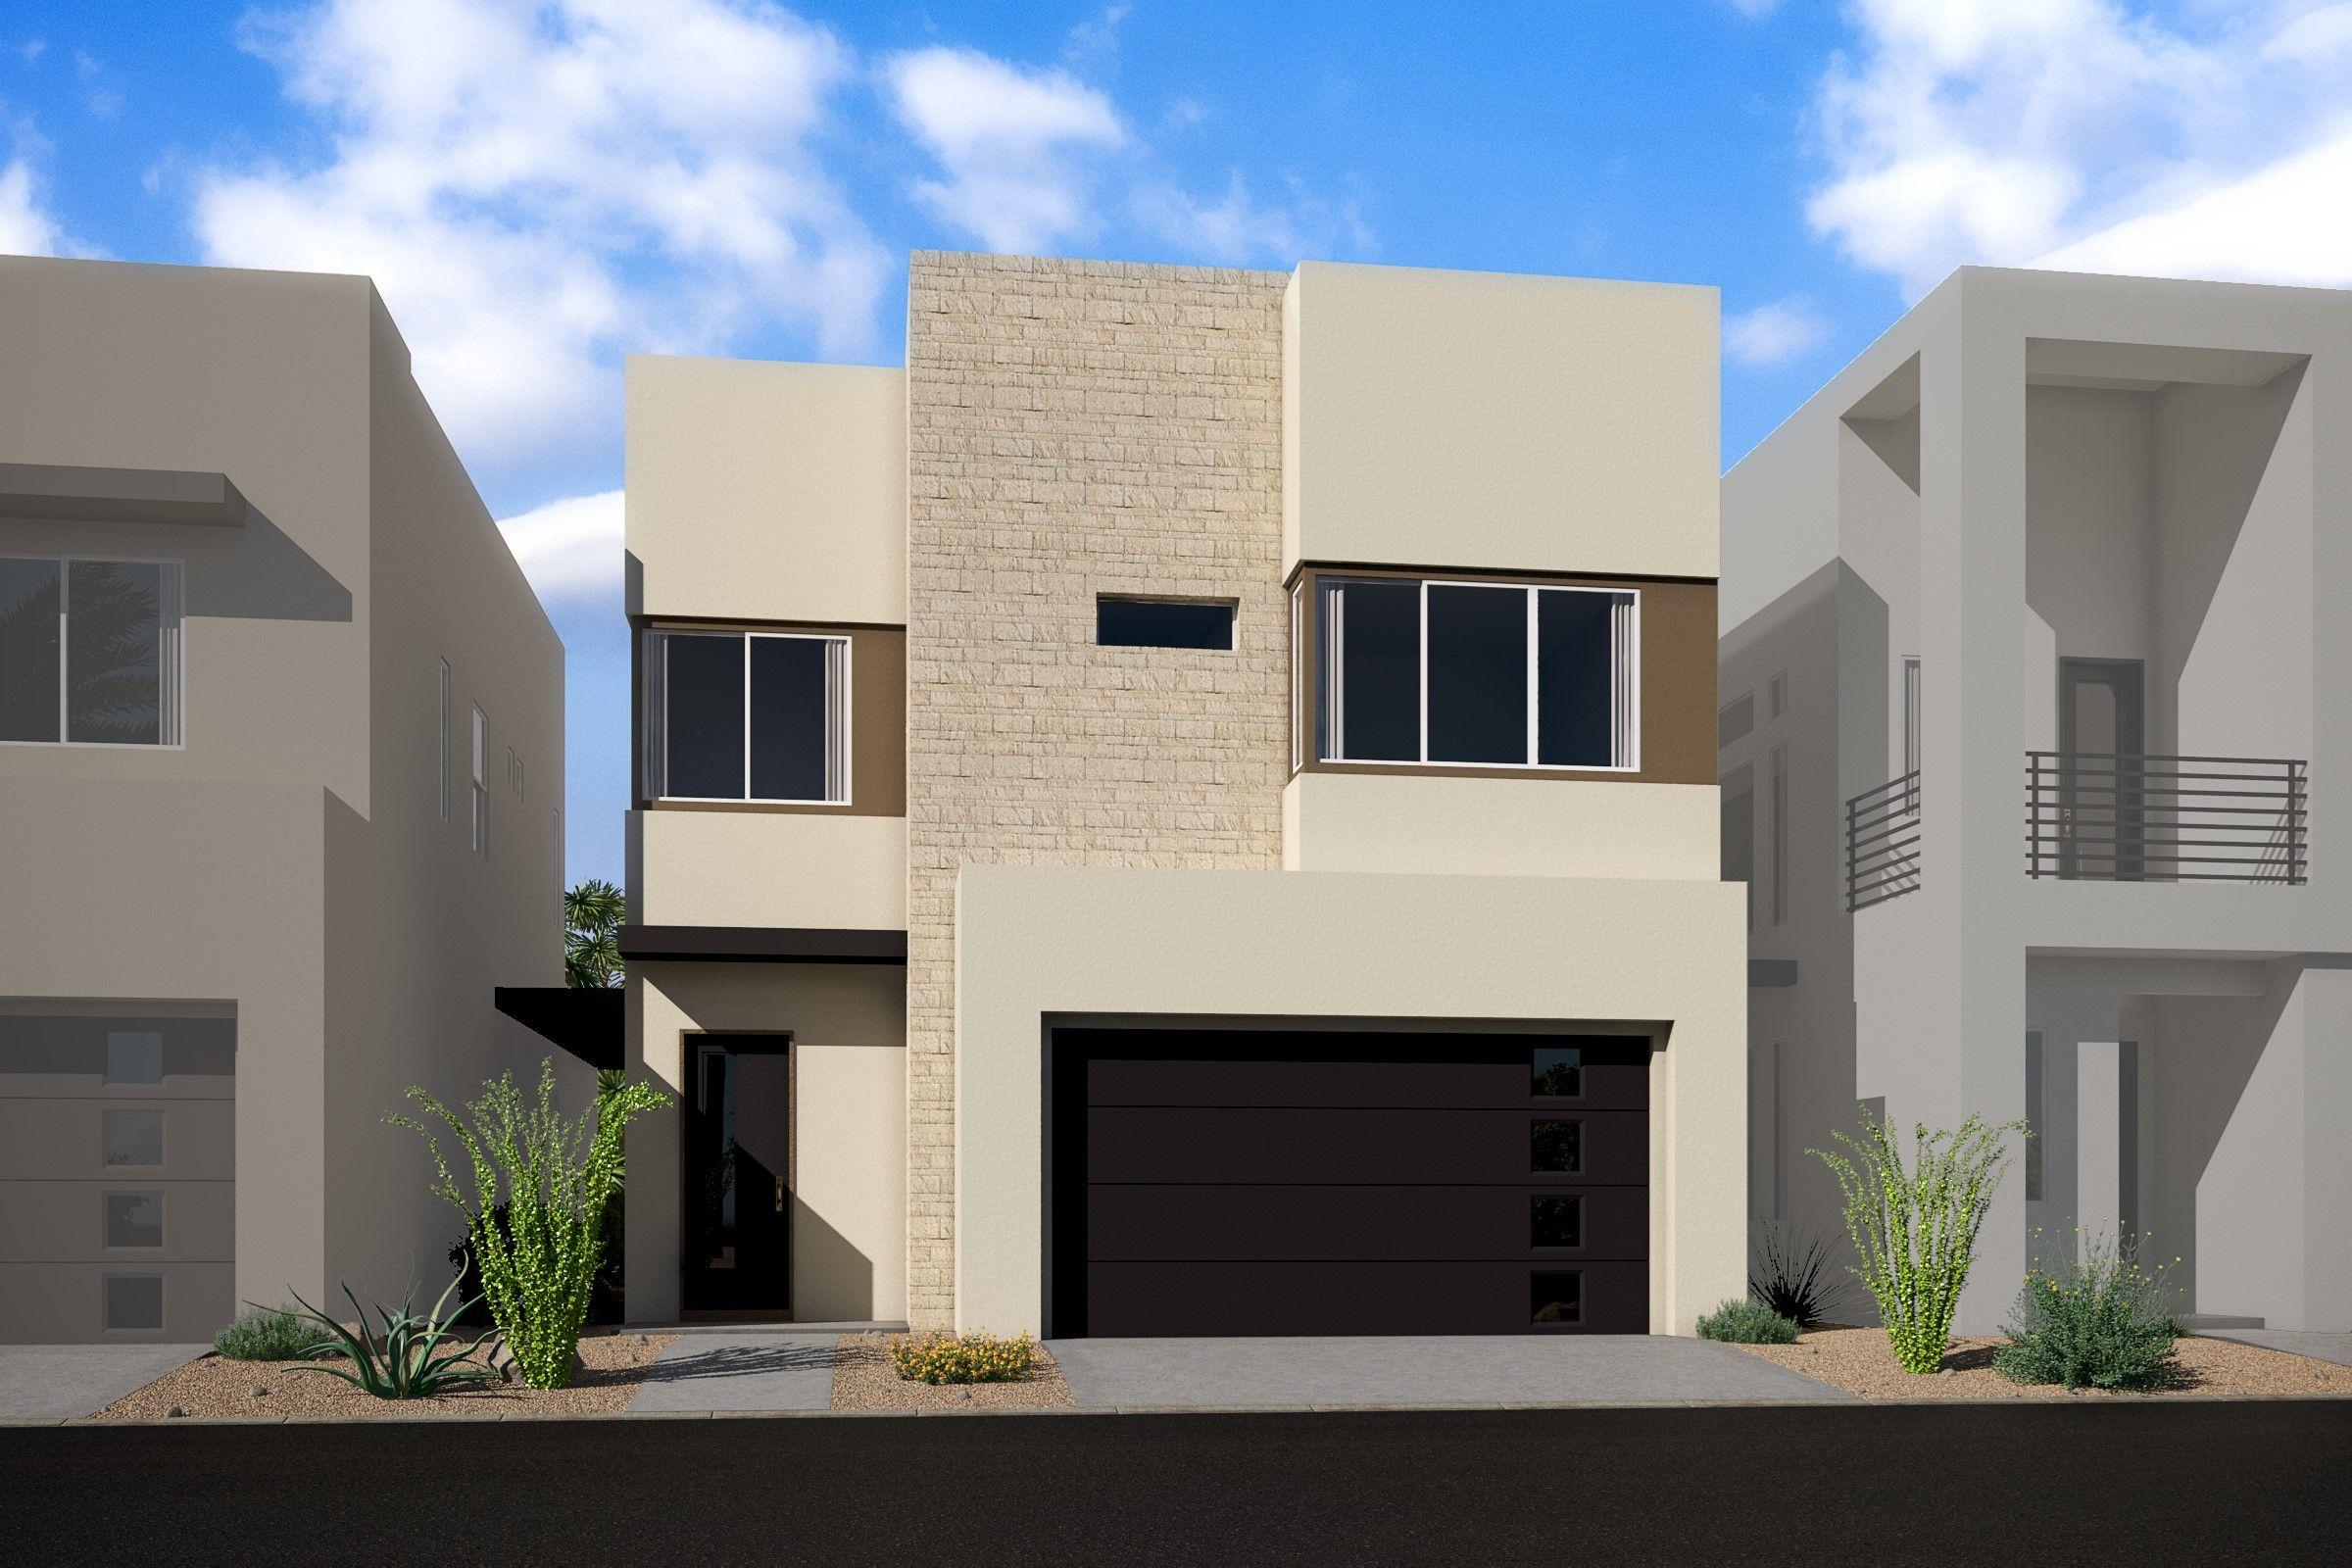 Unifamiliar por un Venta en Skye - Medley 68th Street And Mcdowell Rd Scottsdale, Arizona 85257 United States